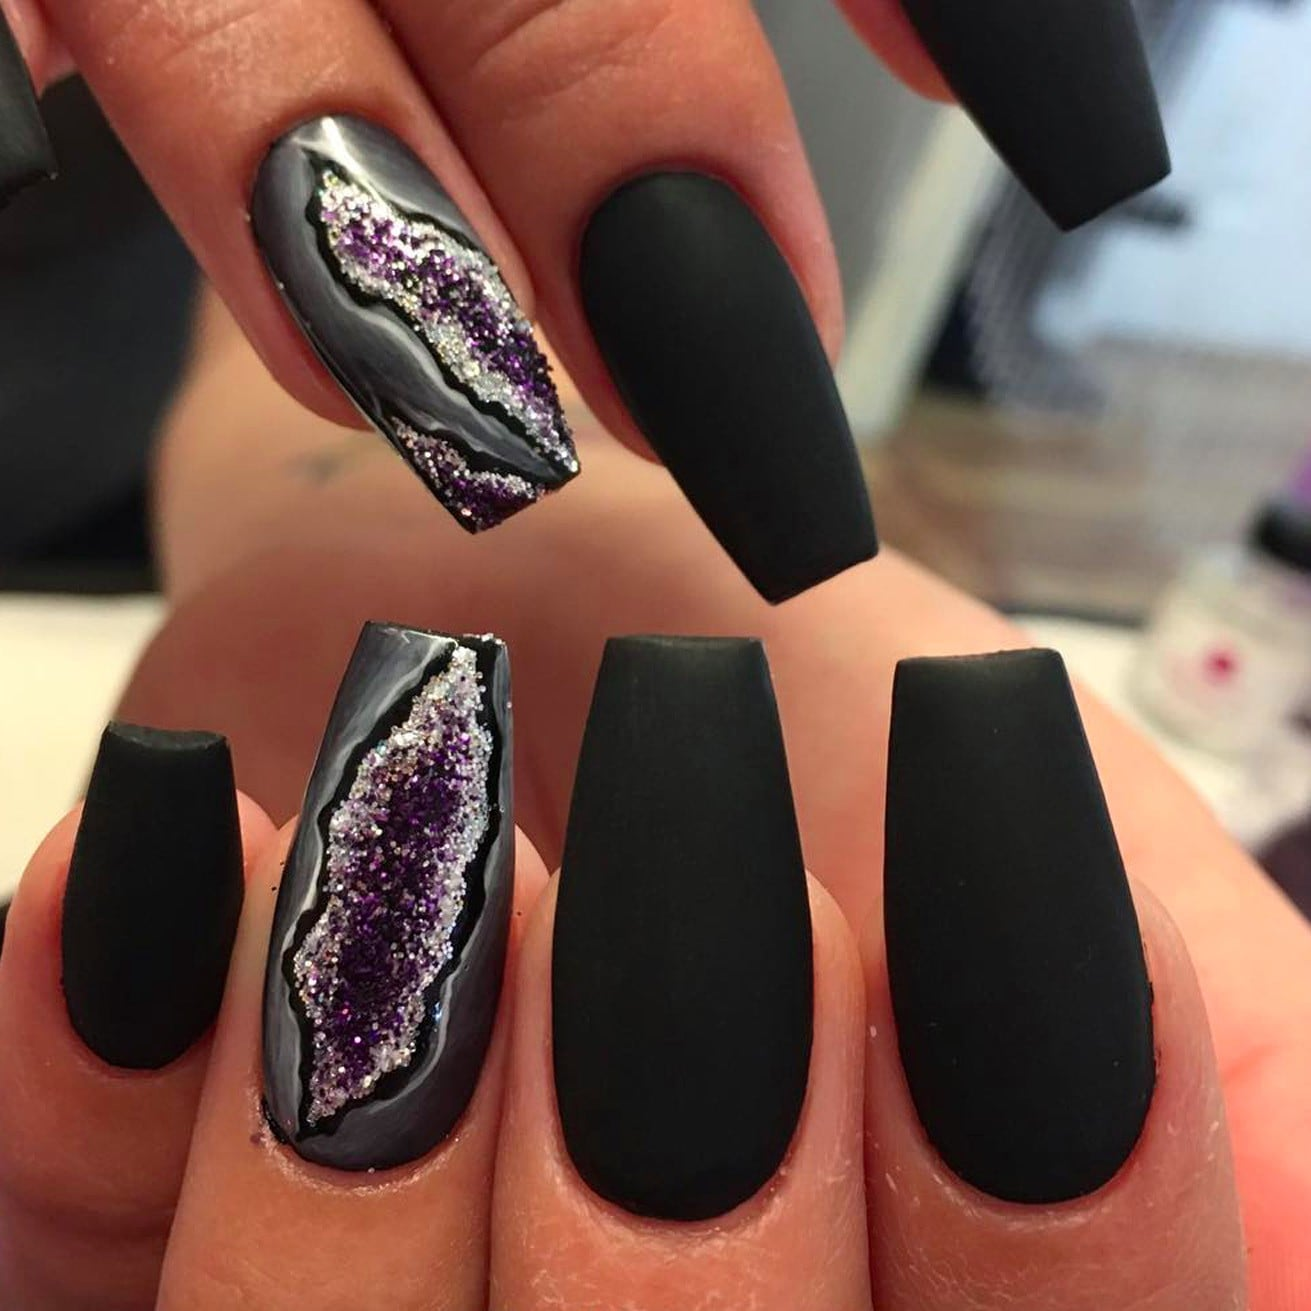 Geode Nail Trend | POPSUGAR Beauty Australia